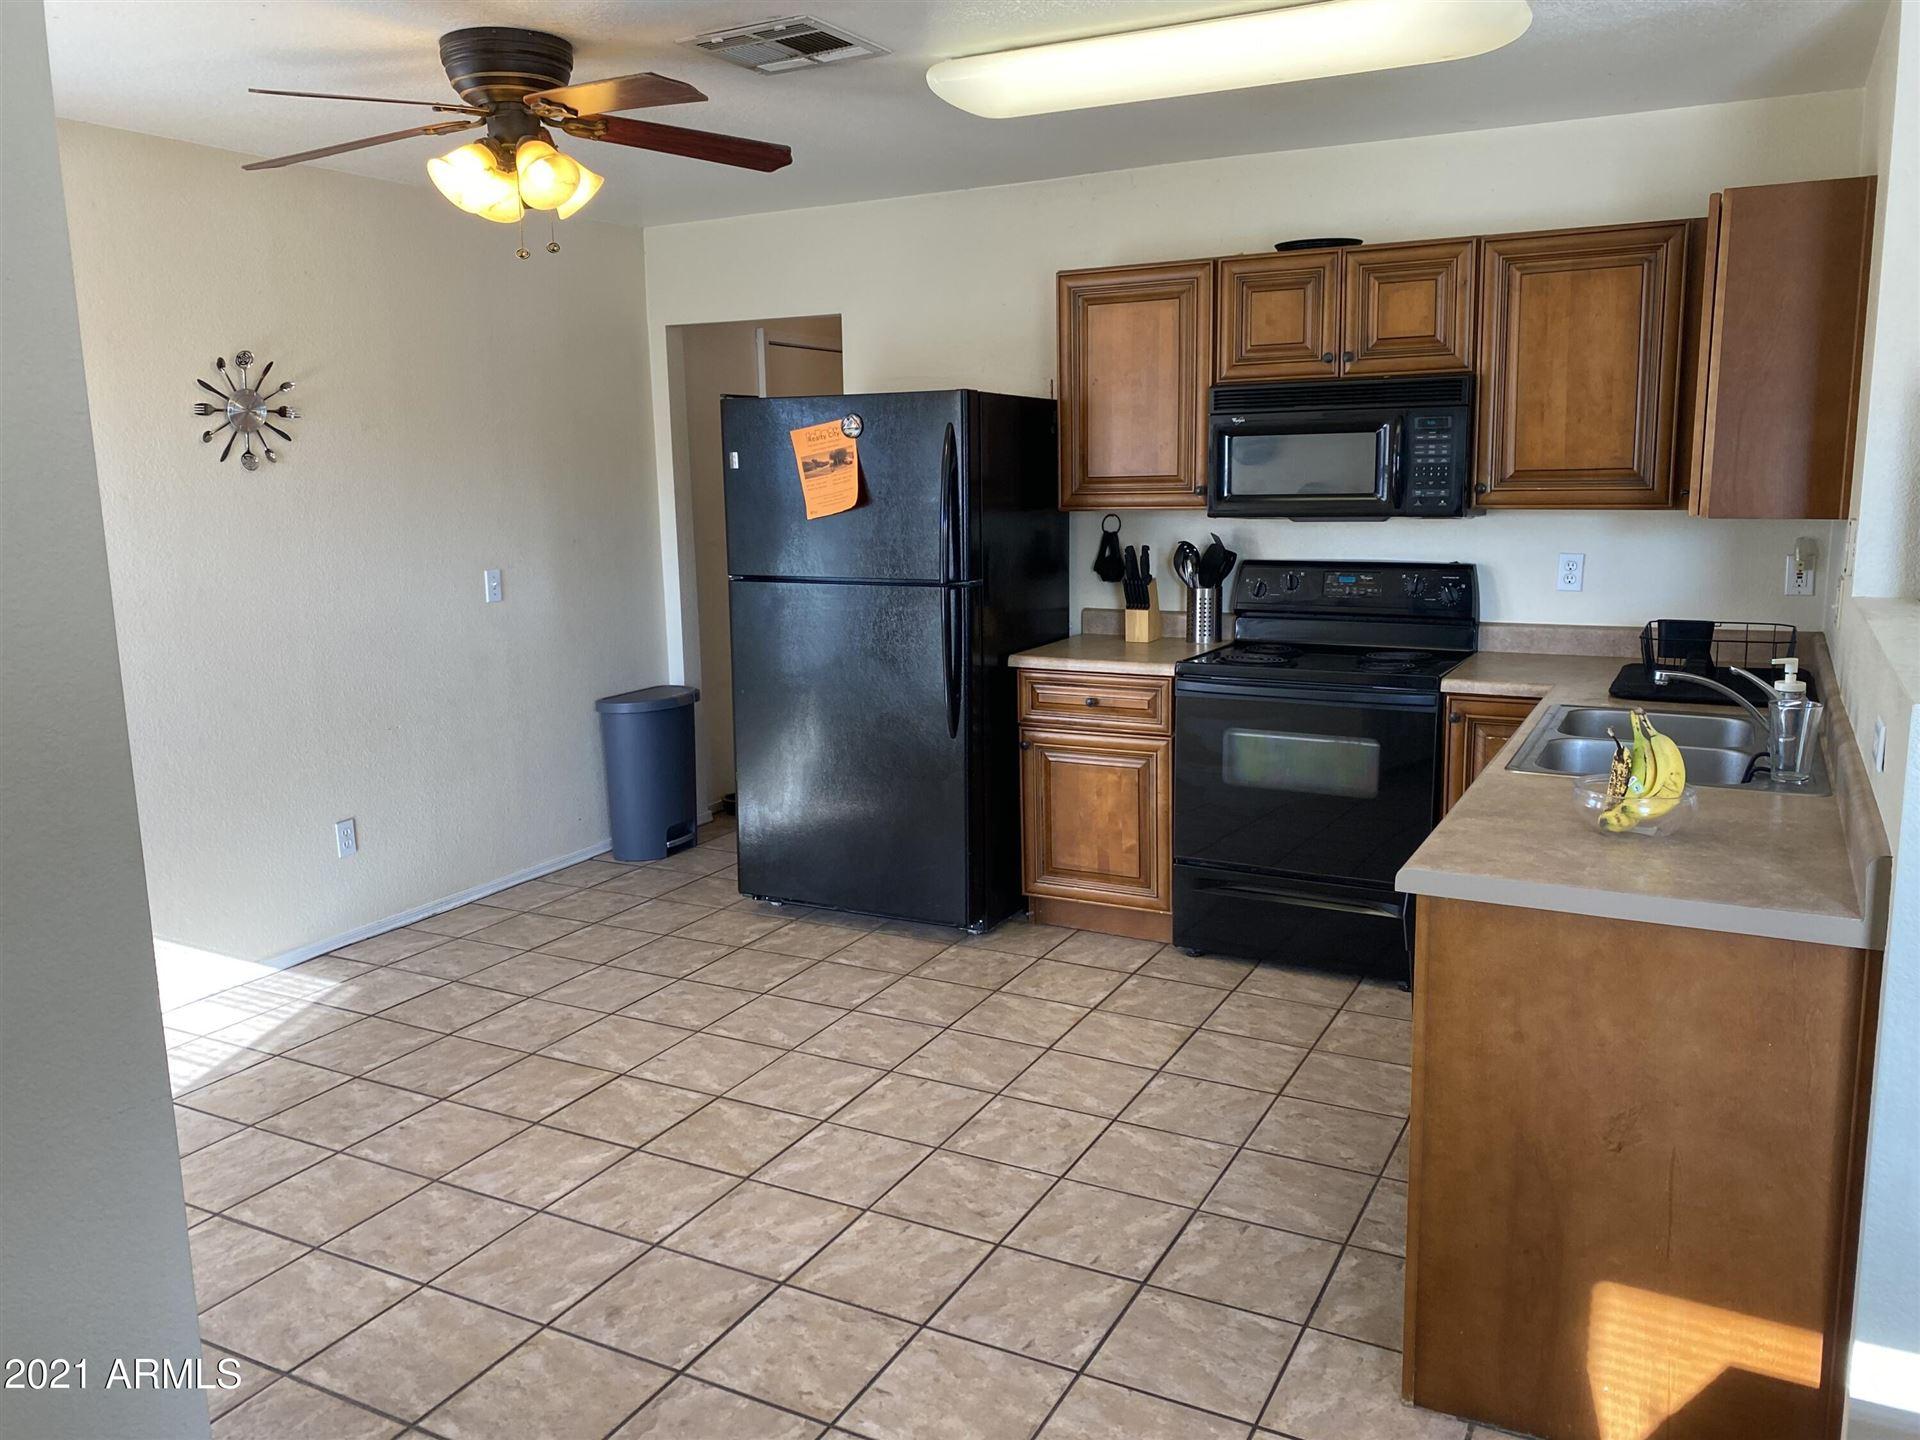 Photo of 11629 W COLUMBINE Drive, El Mirage, AZ 85335 (MLS # 6288447)